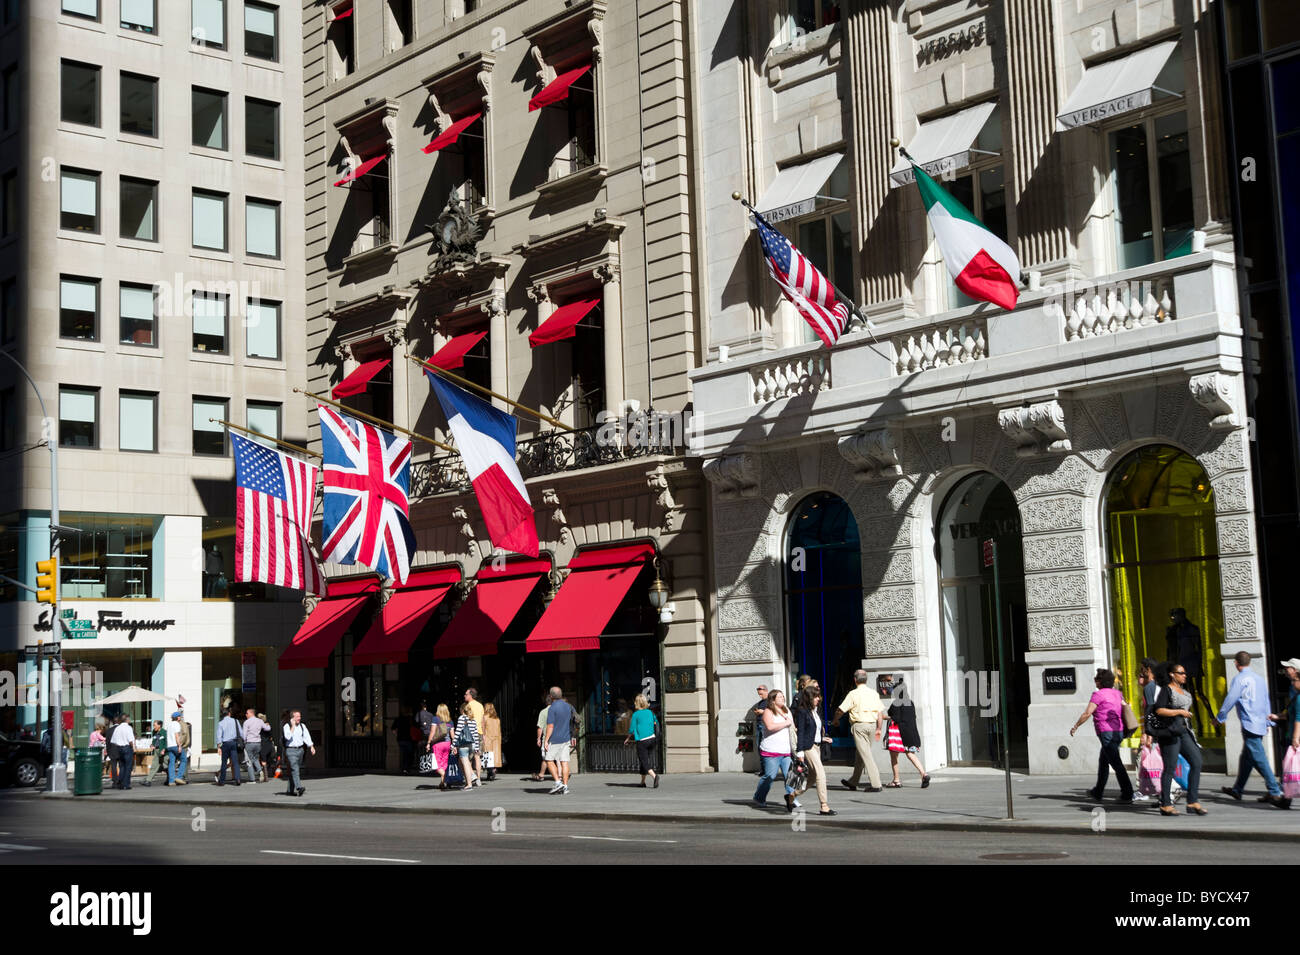 62e4224367 Les magasins de luxe de la cinquième avenue, new york city, usa Photo Stock